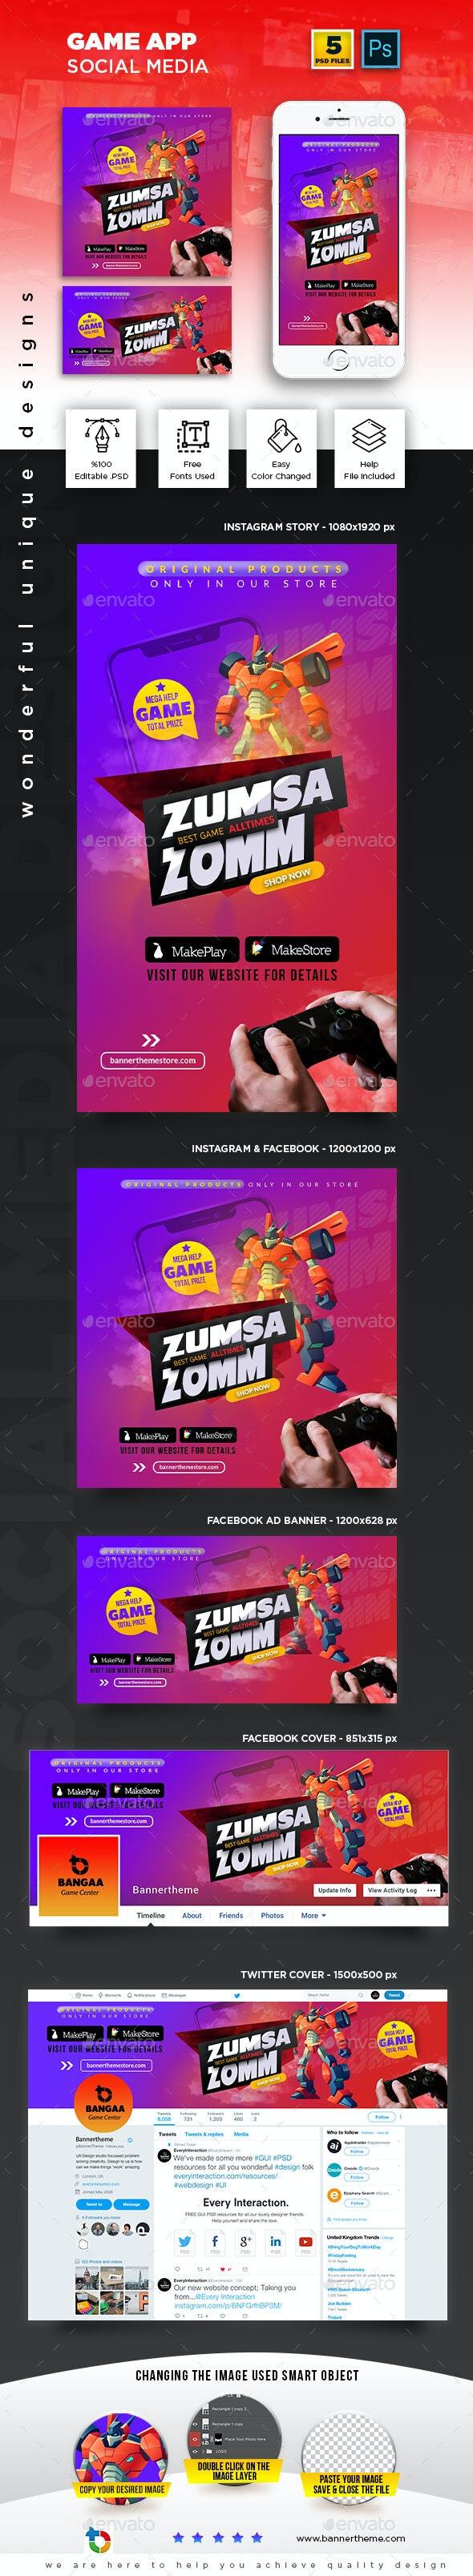 Game App Social Media Banner - Social Media Web Elements